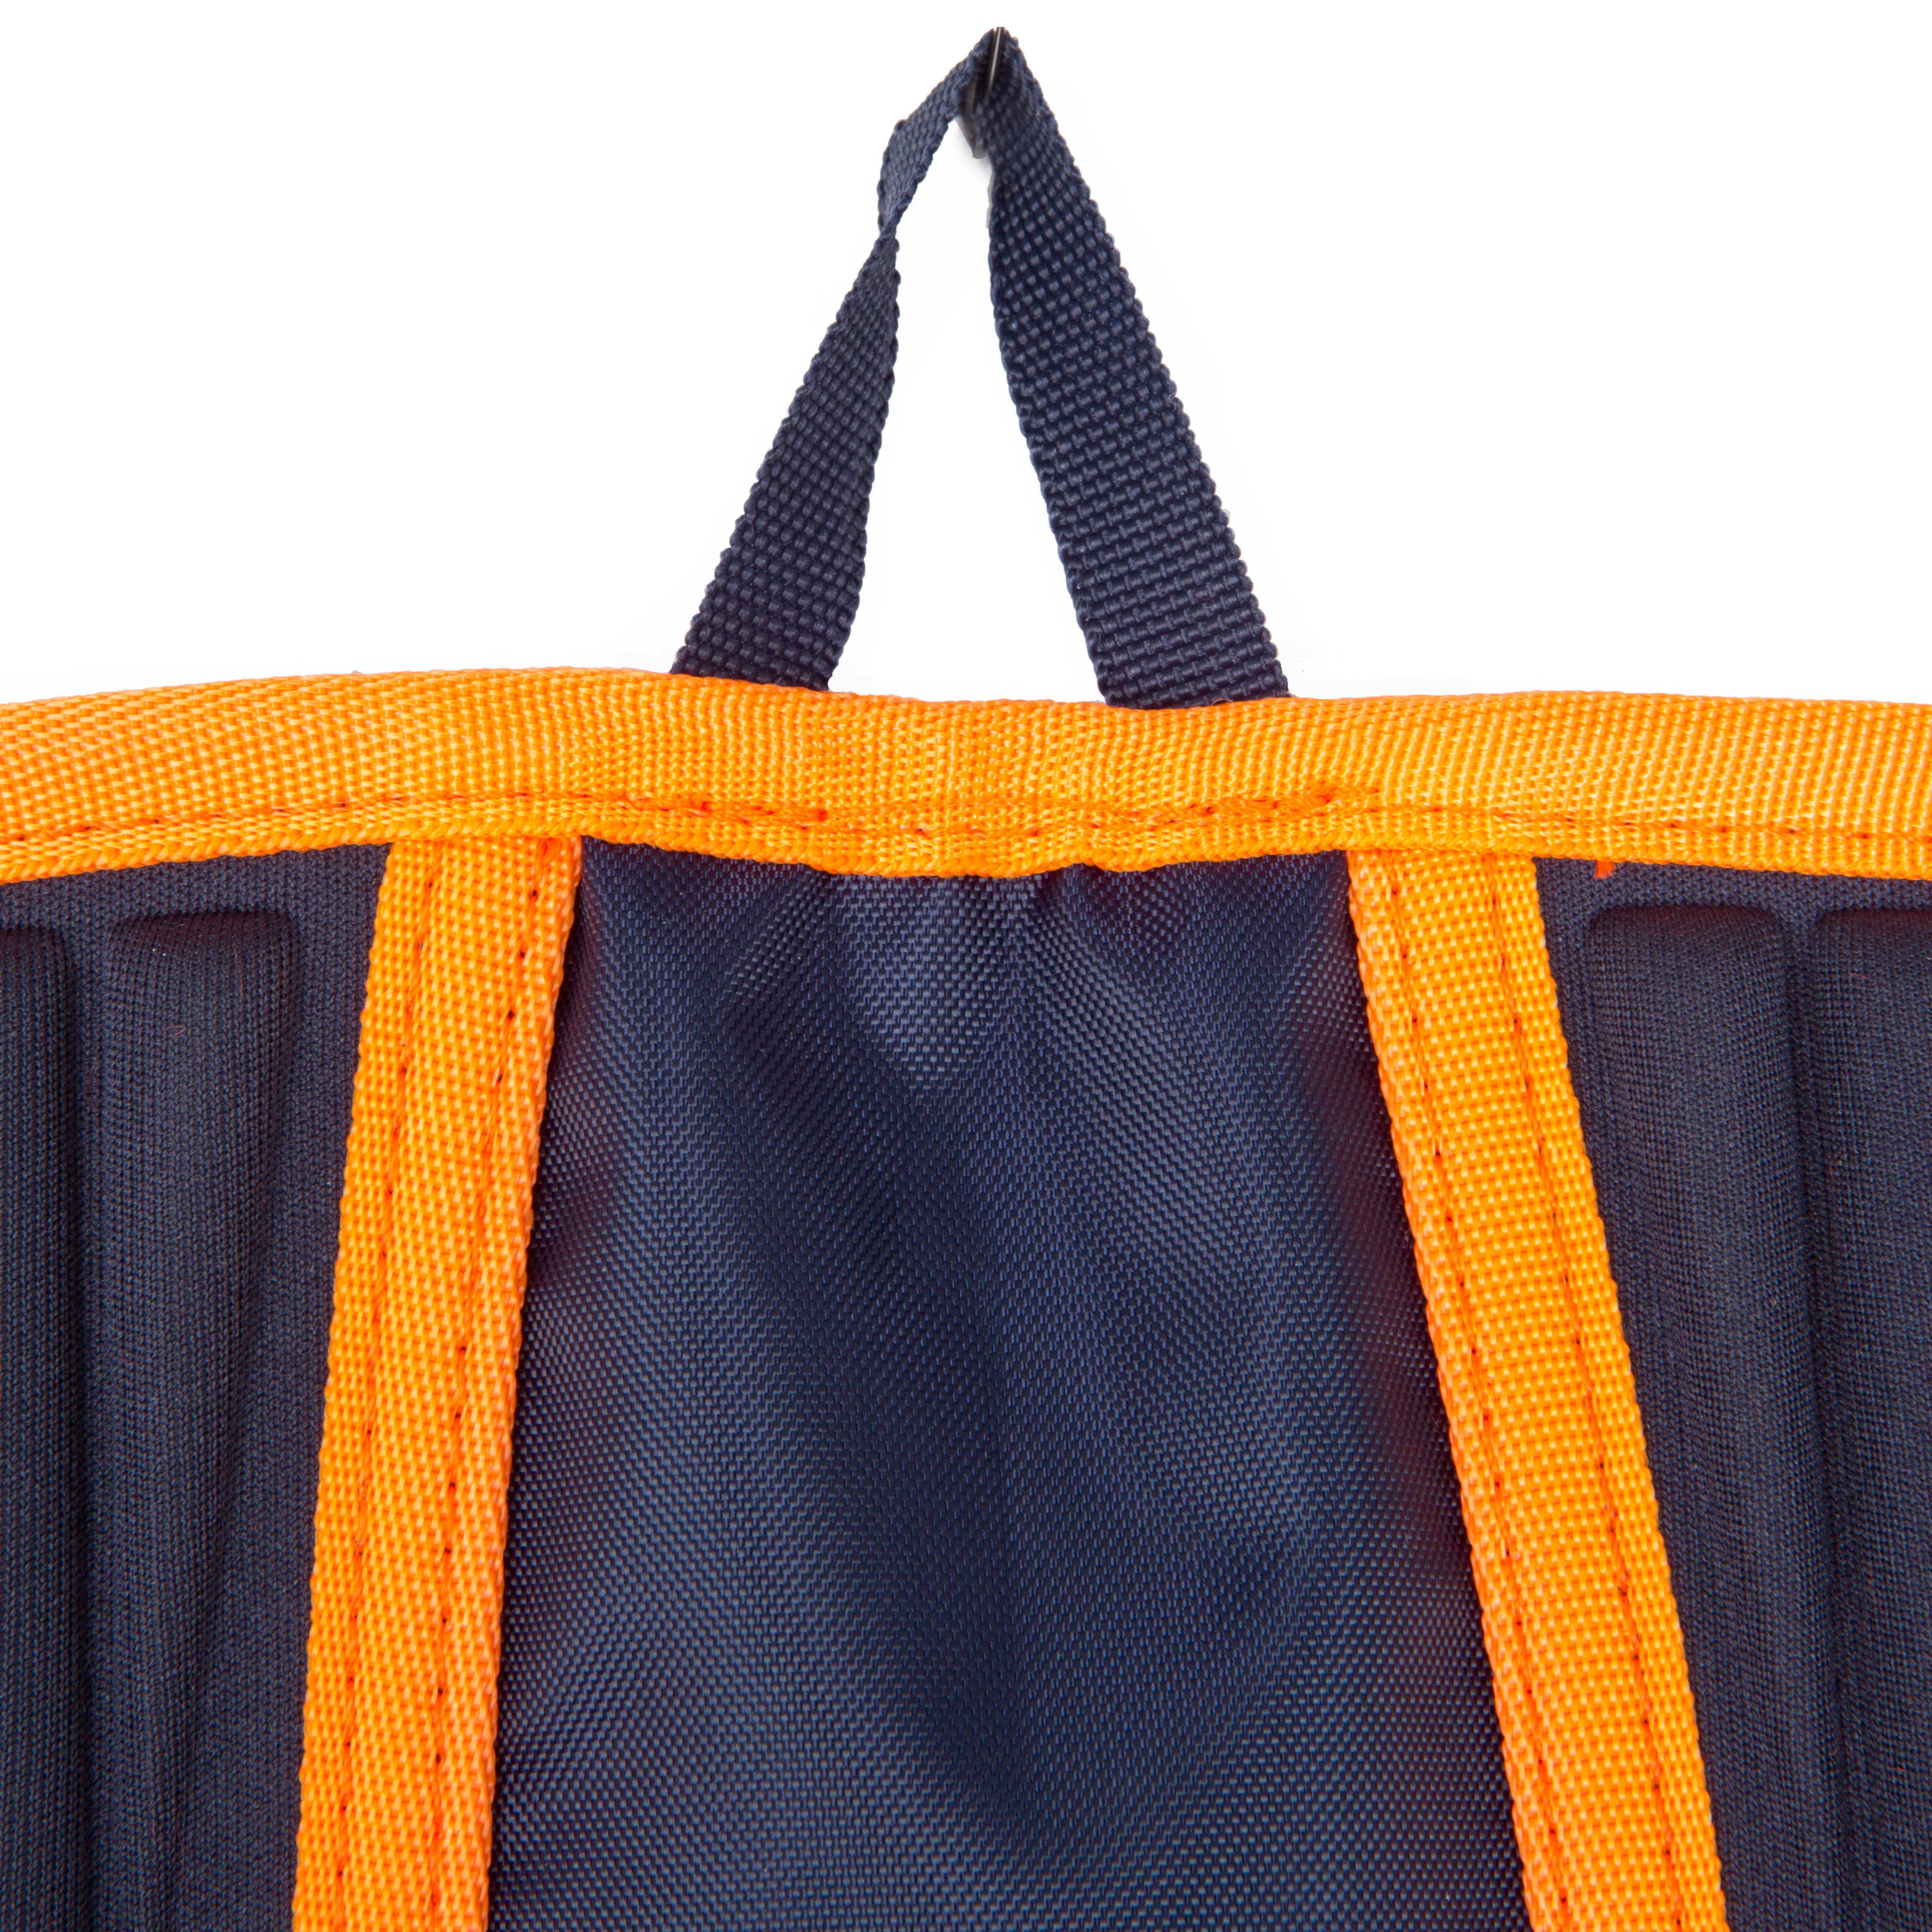 Hygiene feet pool mat - Blue Orange